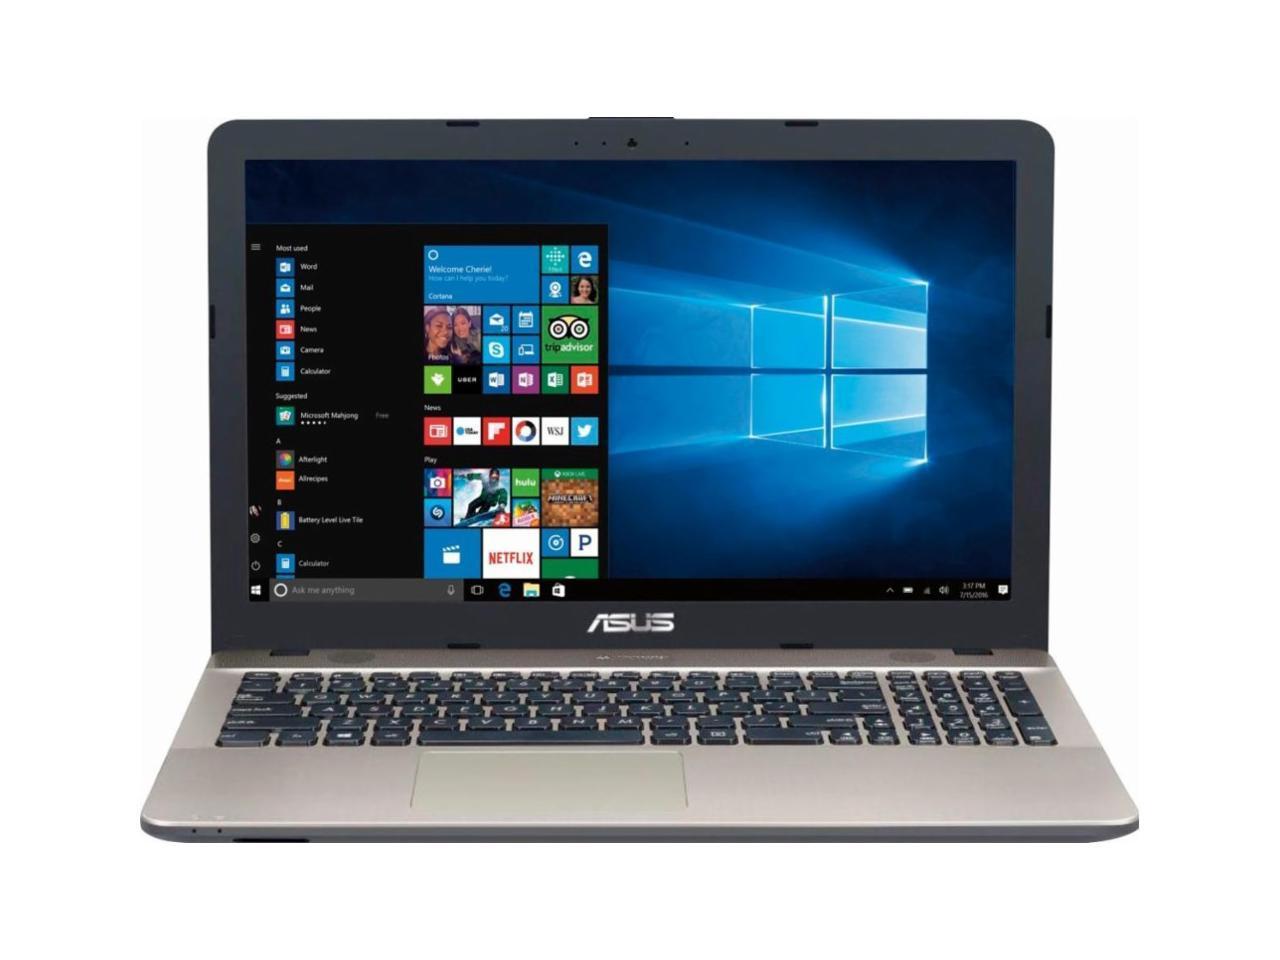 Asus VivoBook Max X541NA: 15.6'' 768P, Pentium N4200, 4GB Ram, 500GB HDD, Type-C, DVD-RW, Win10H @ $220 + F/S